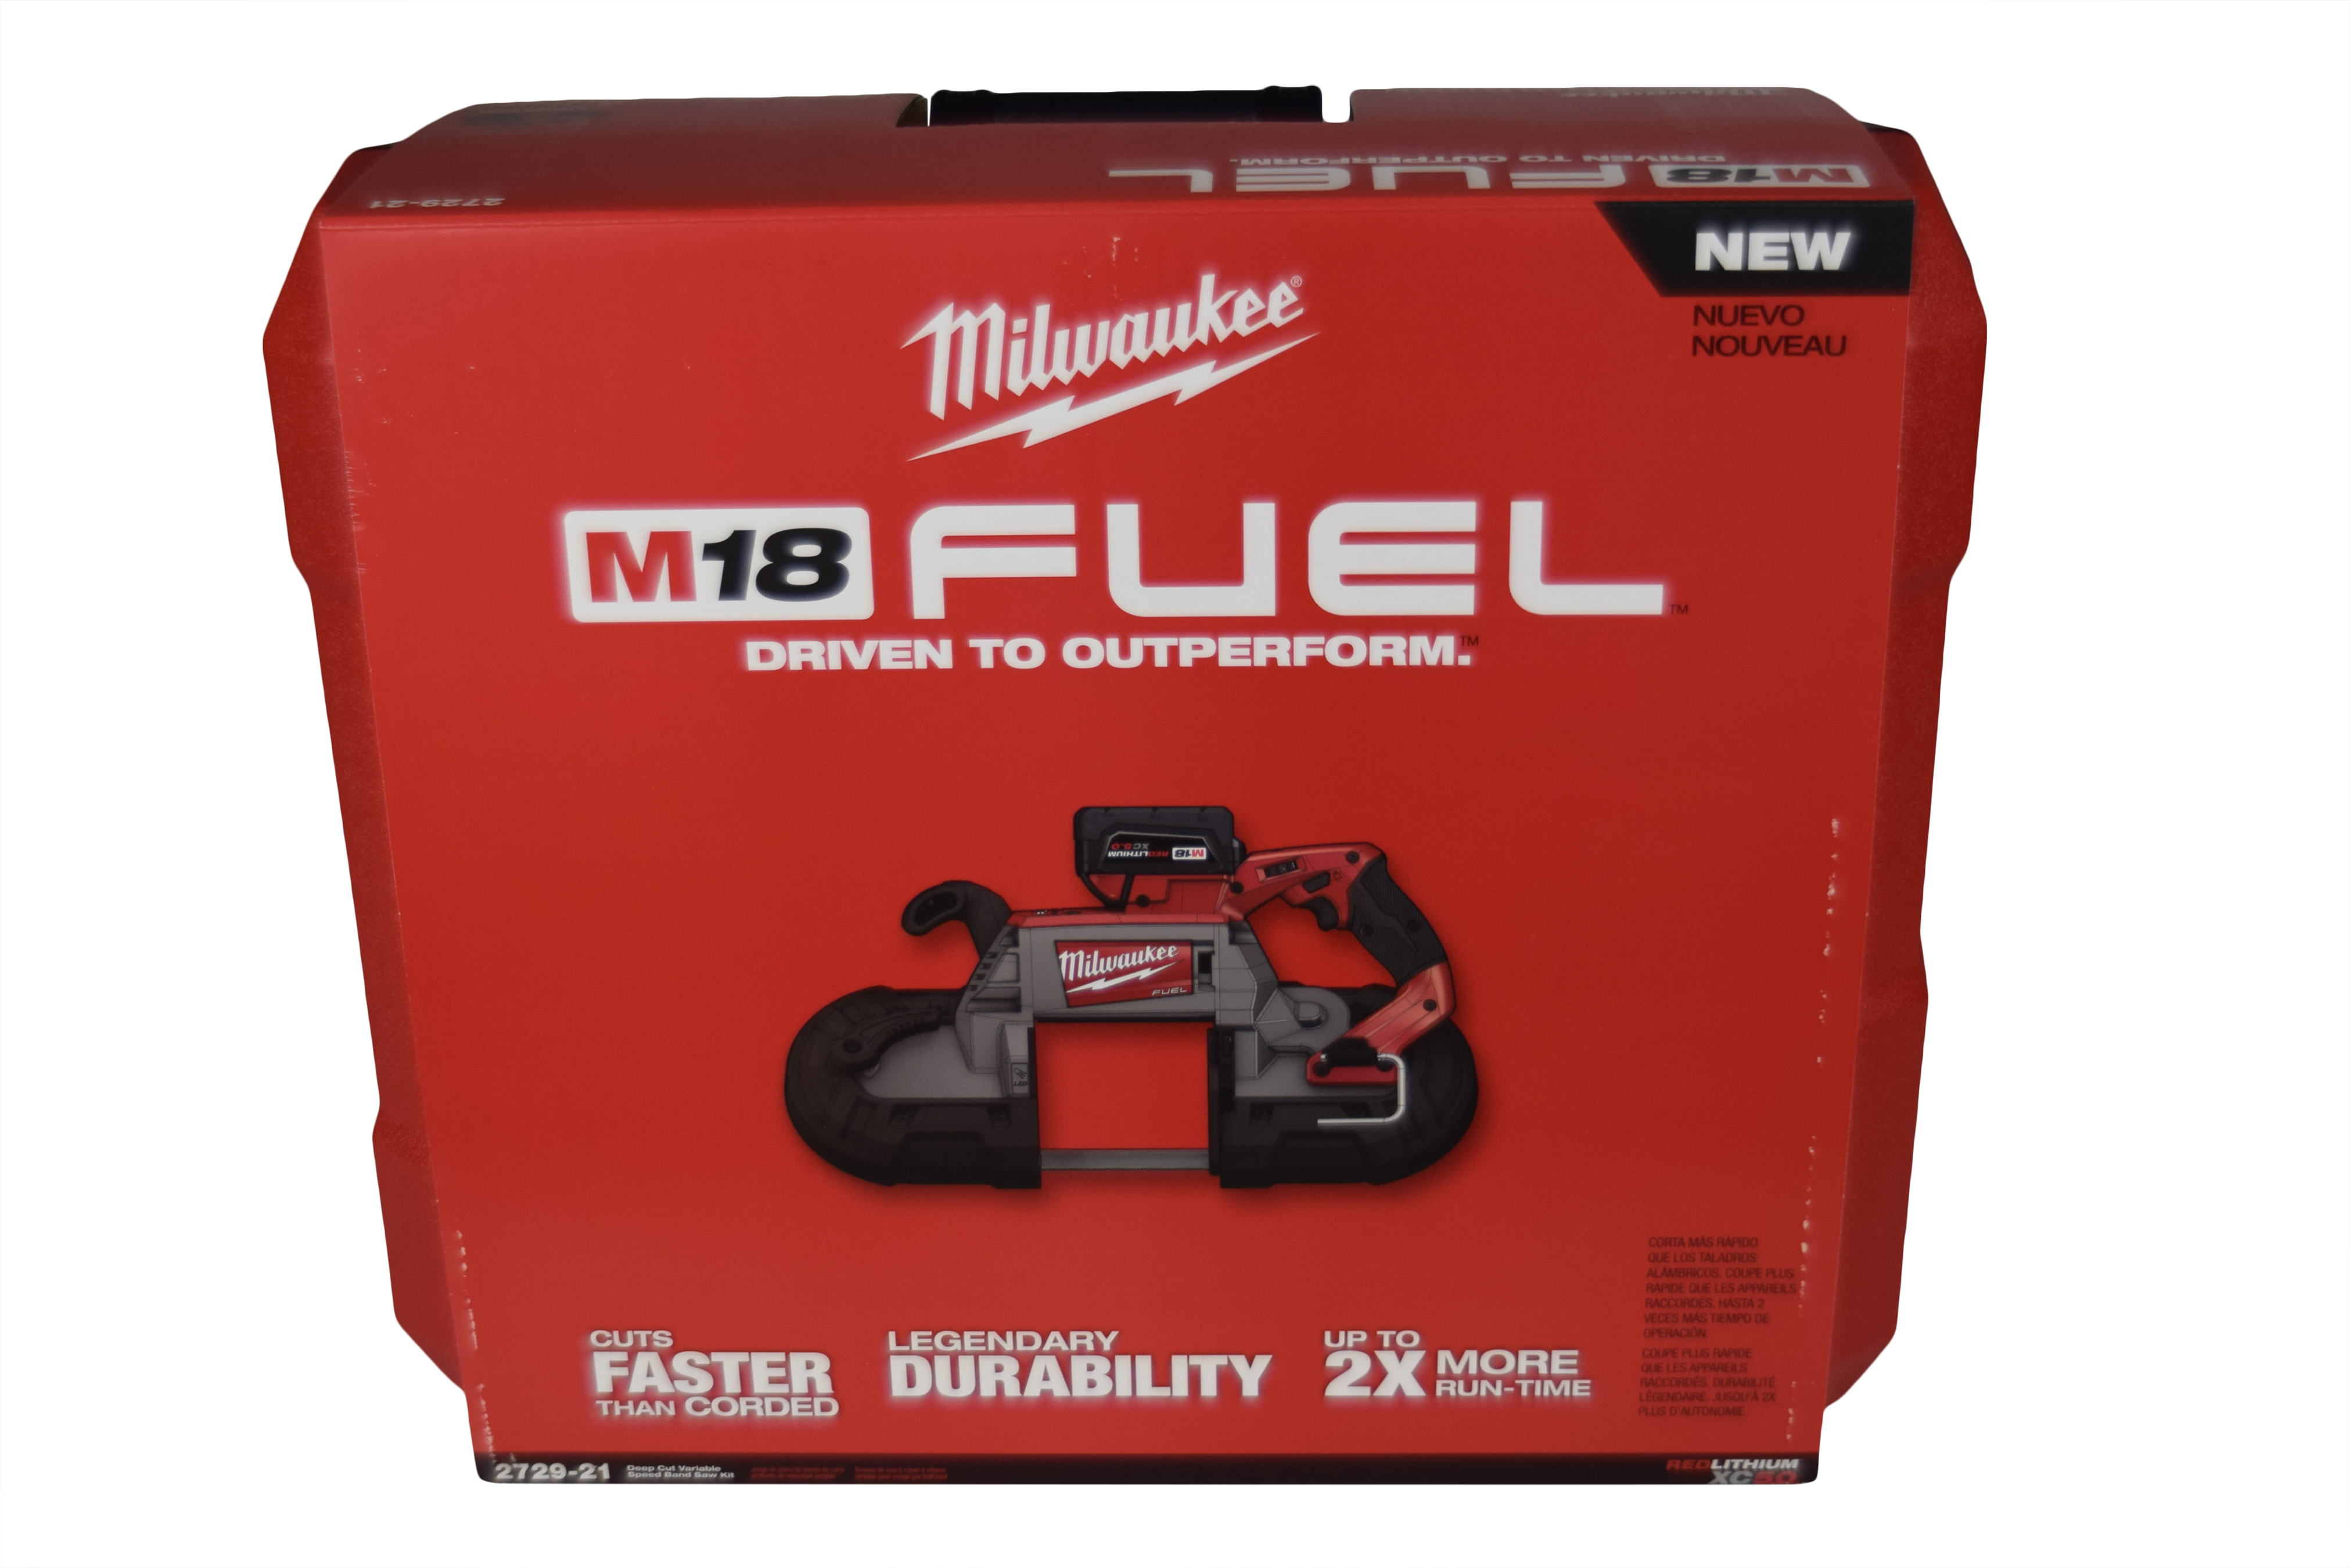 Milwaukee 2729-21 M18 FUEL 18V Lithium-Ion Brushless Cordless Deep Cut Band  Saw